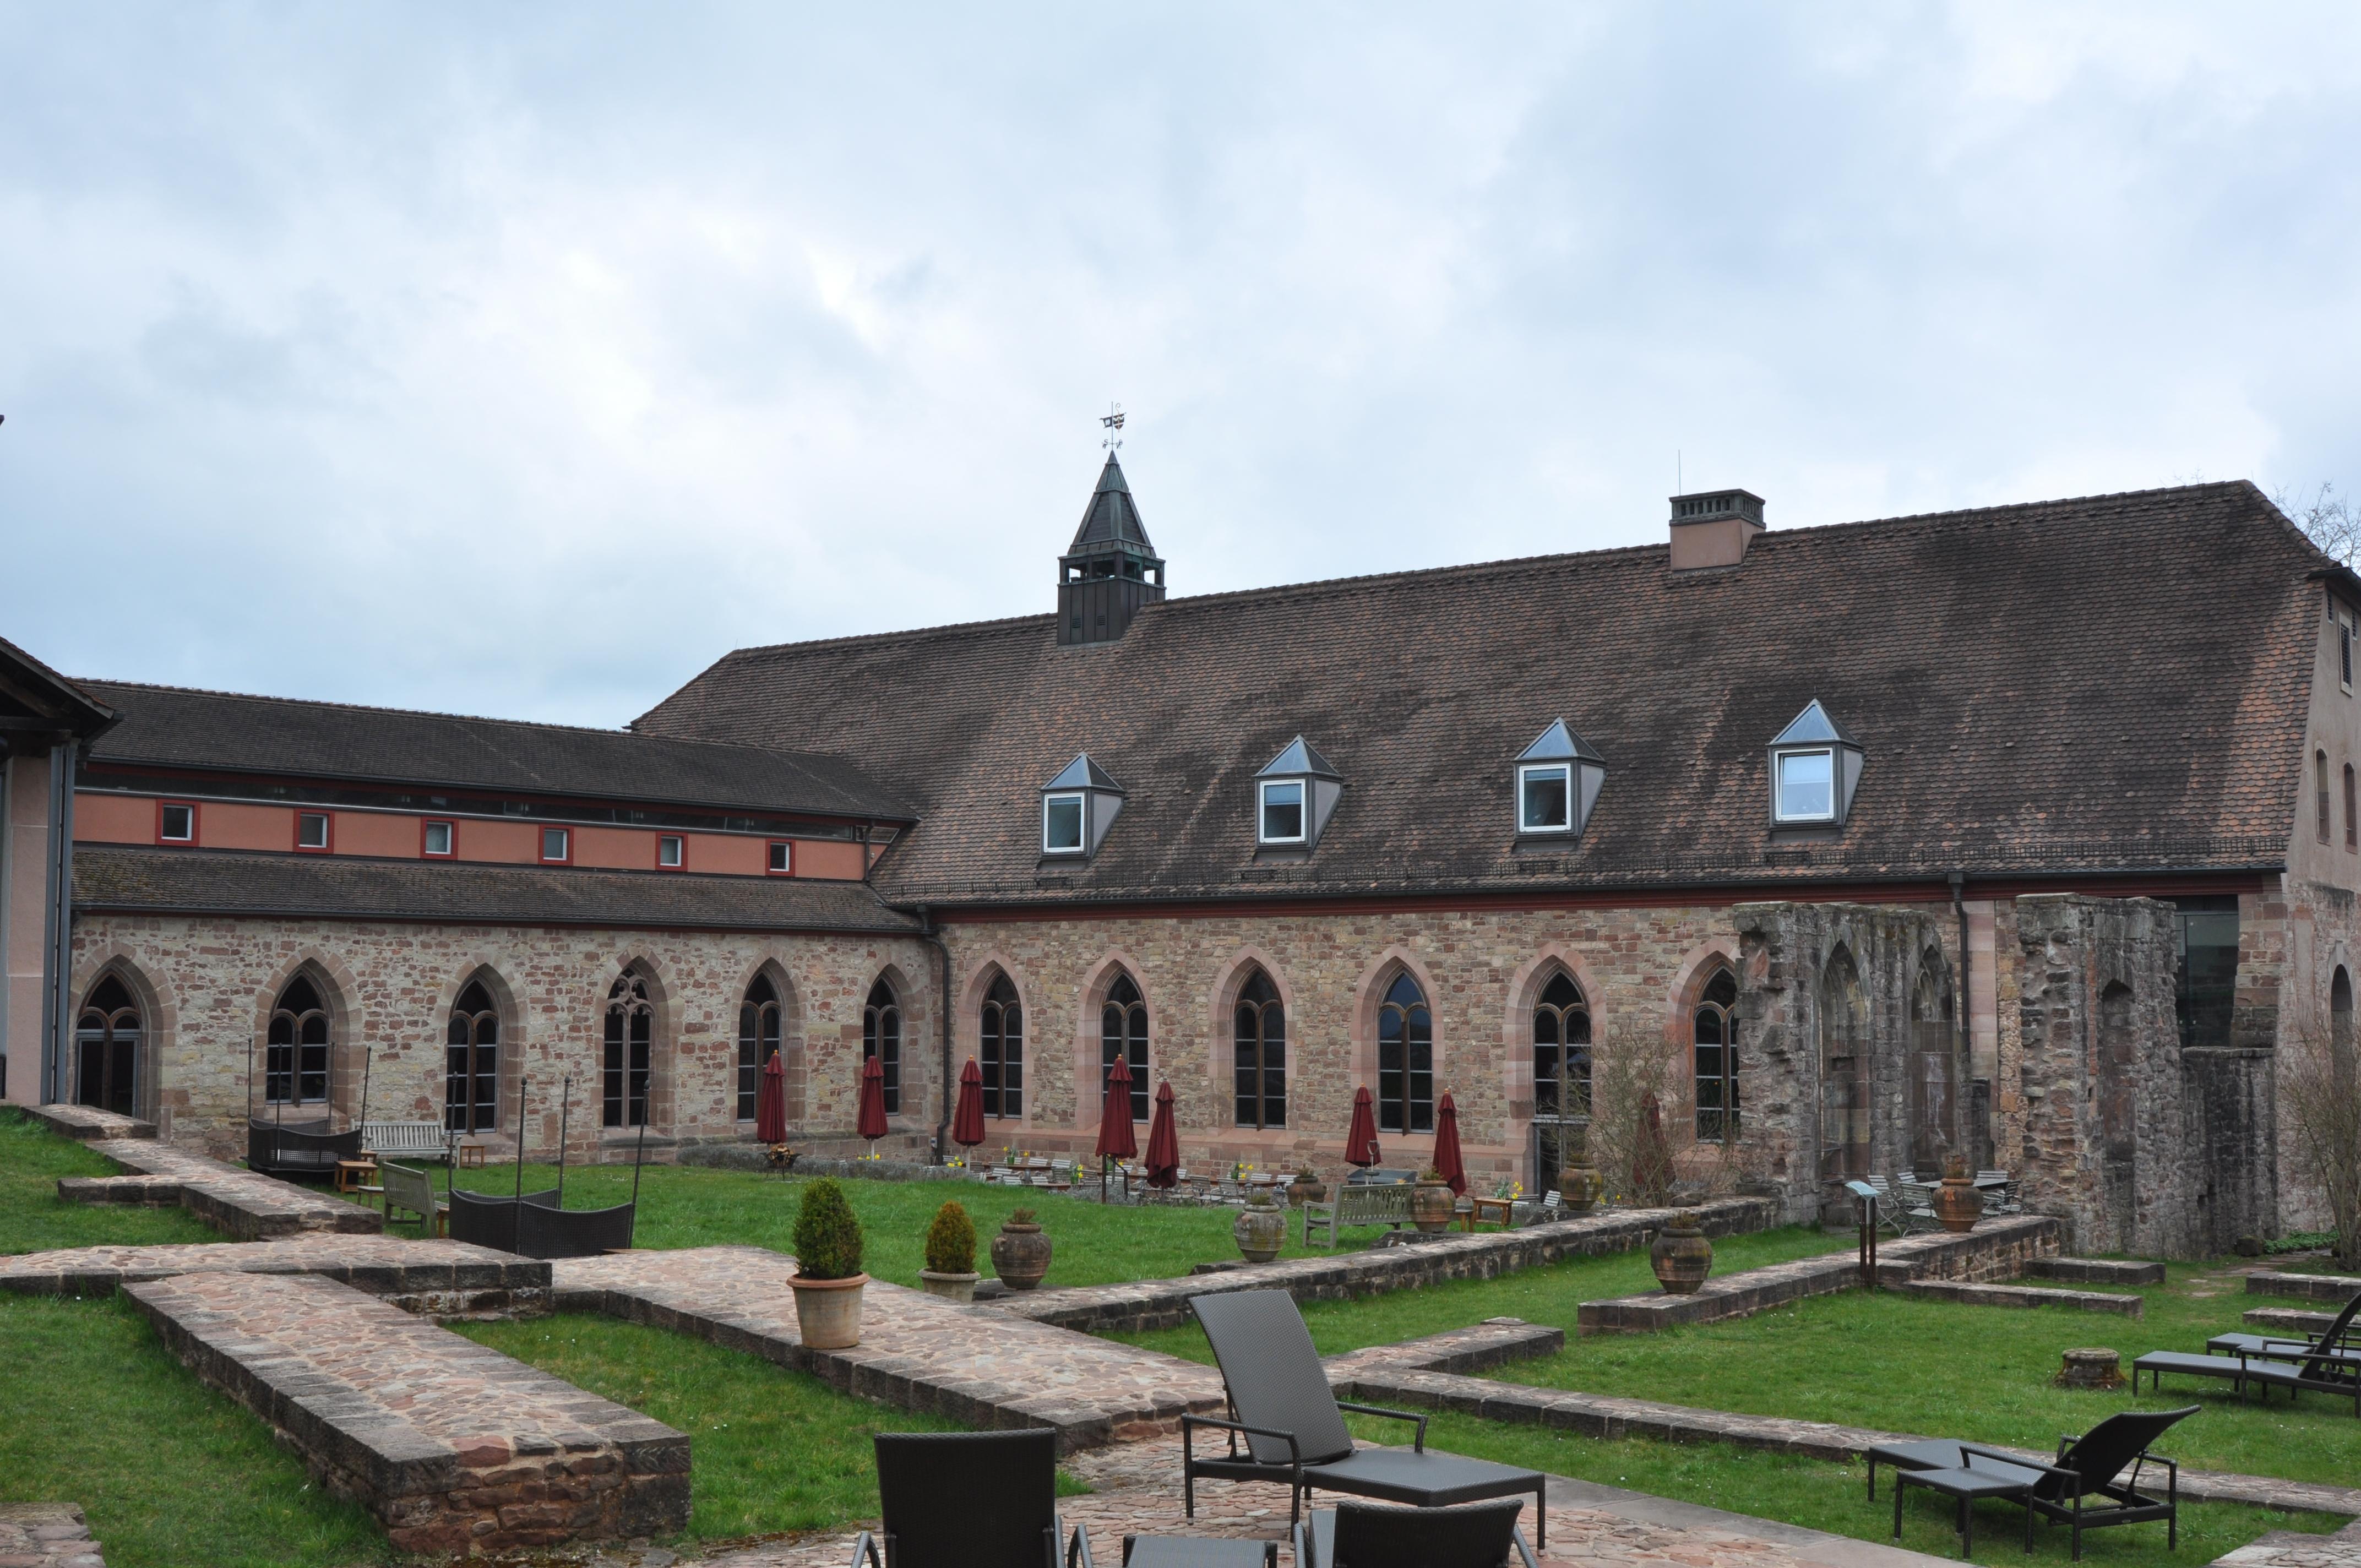 Datei:KlosterHornbach KonventHotel.JPG – Wikipedia